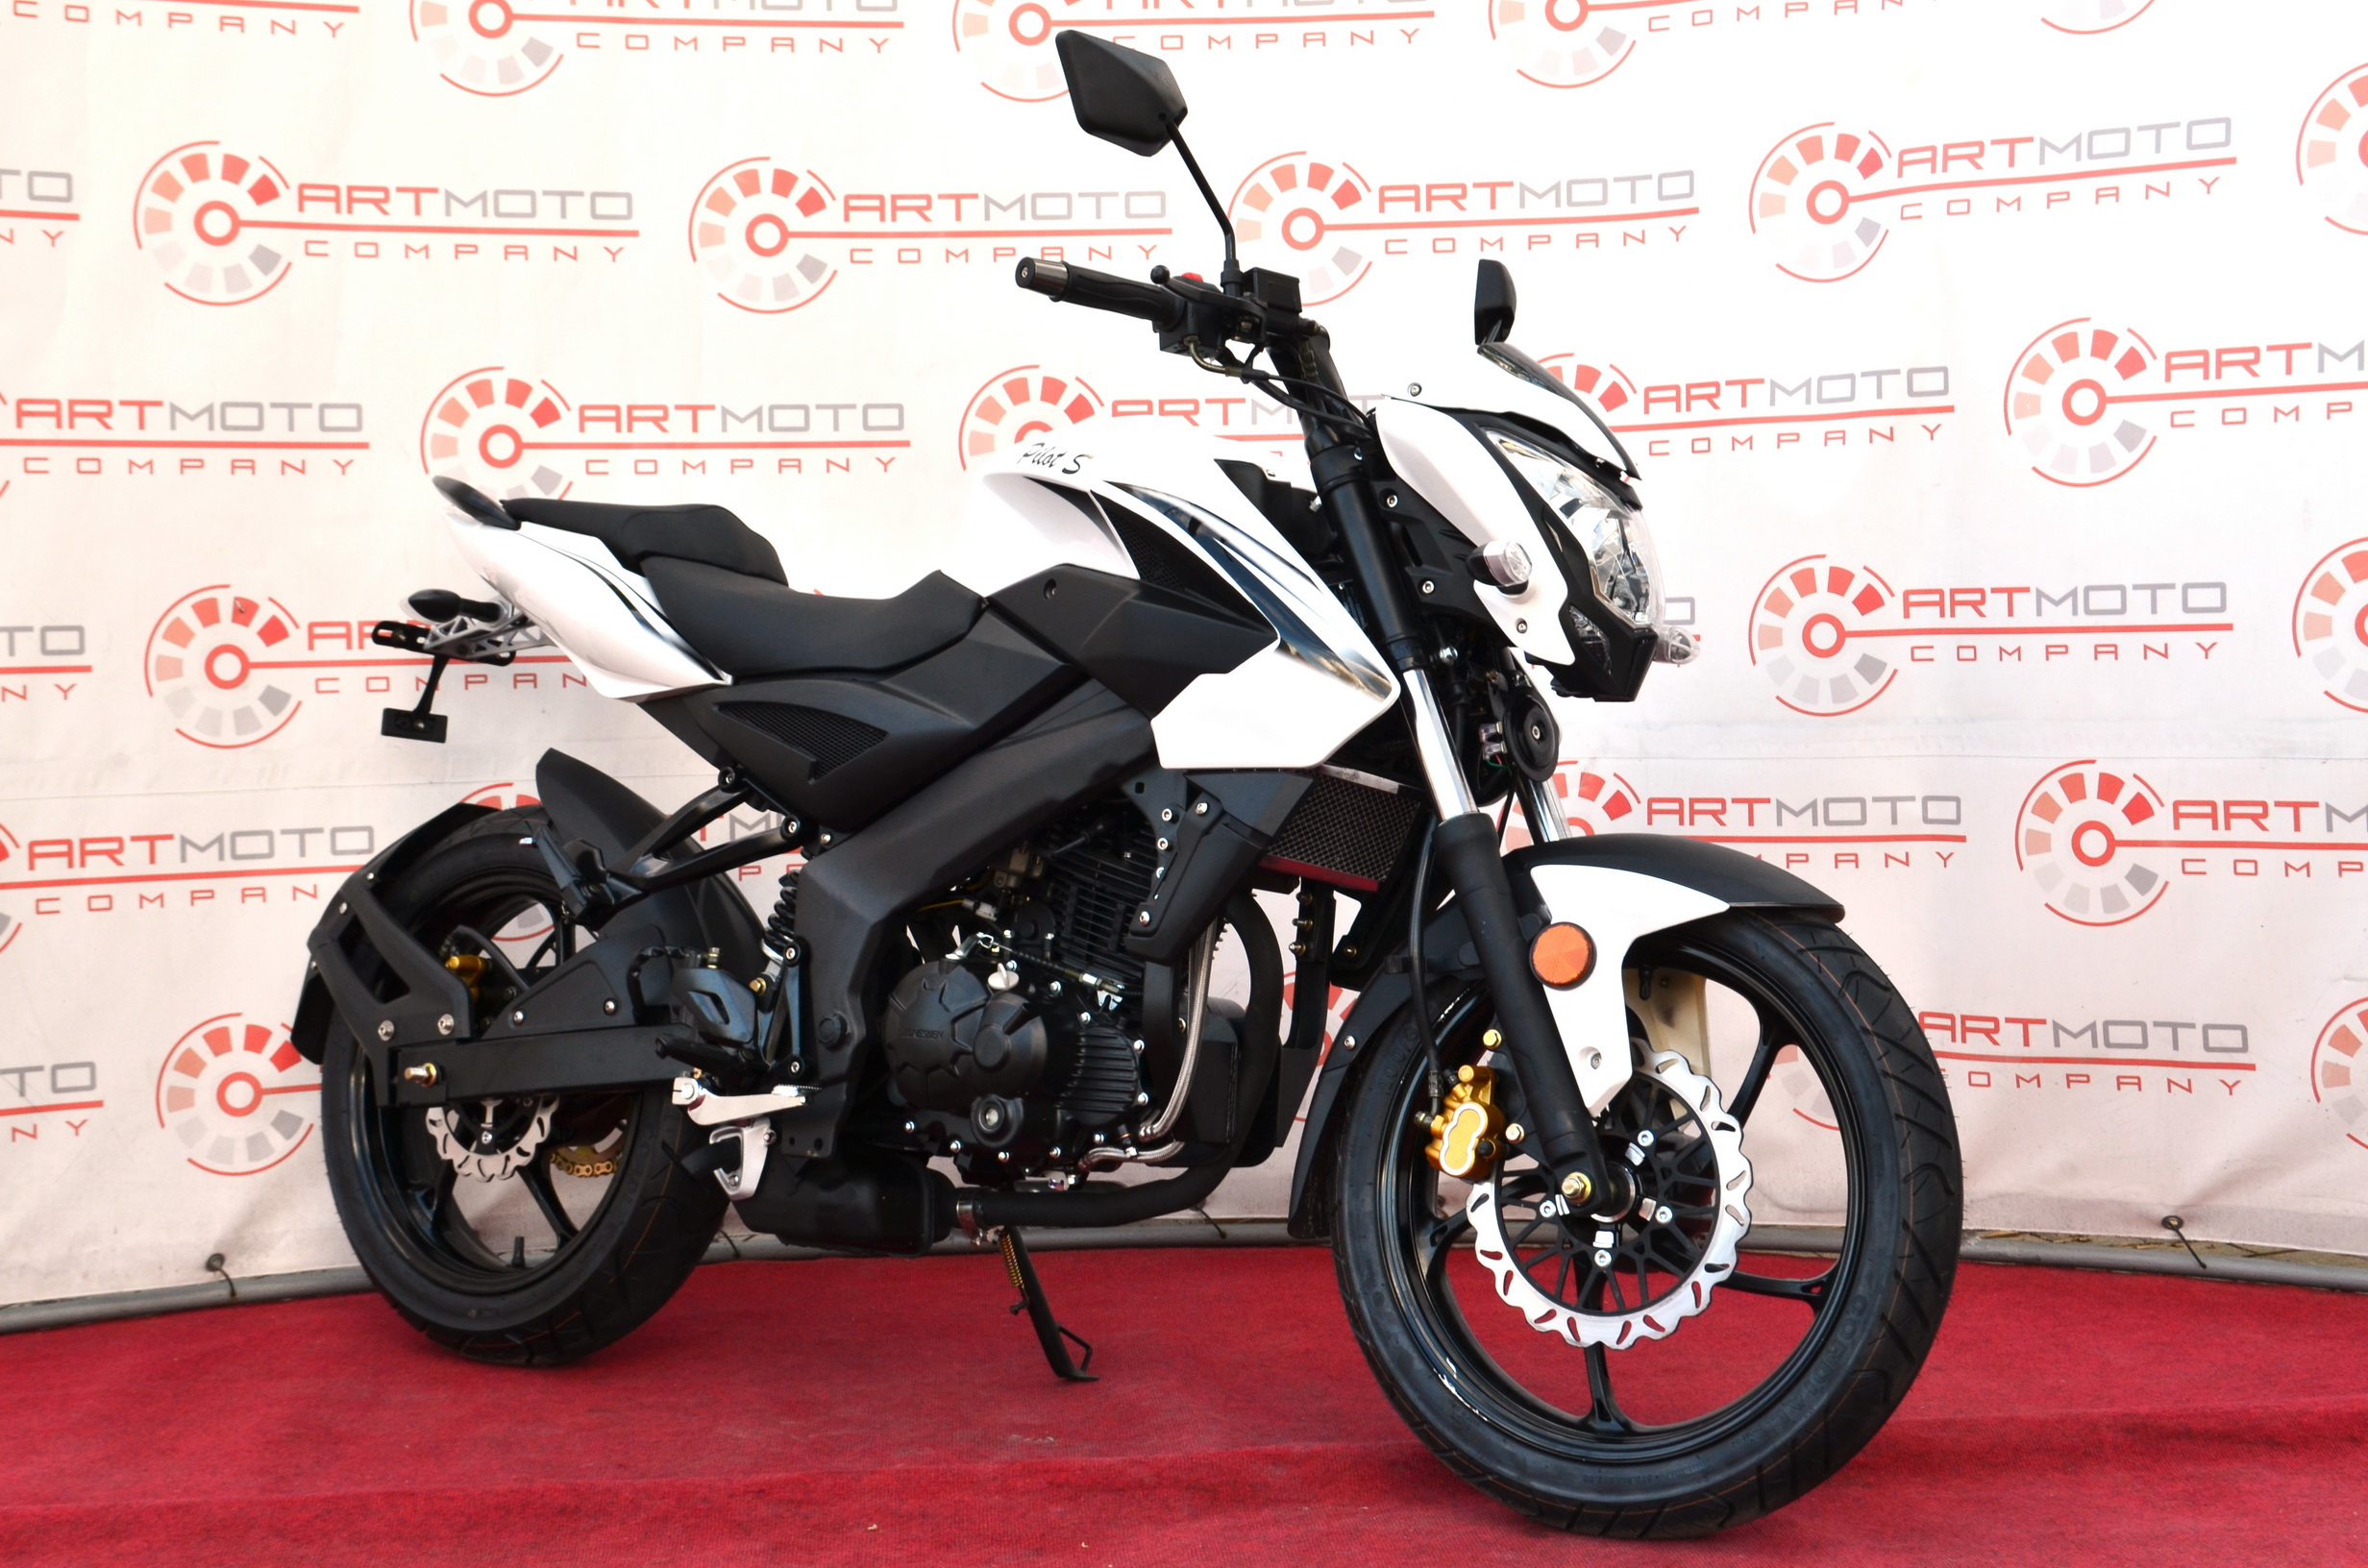 МОТОЦИКЛ BASHAN PILOT S 250 White ― Артмото - купить квадроцикл в украине и харькове, мотоцикл, снегоход, скутер, мопед, электромобиль